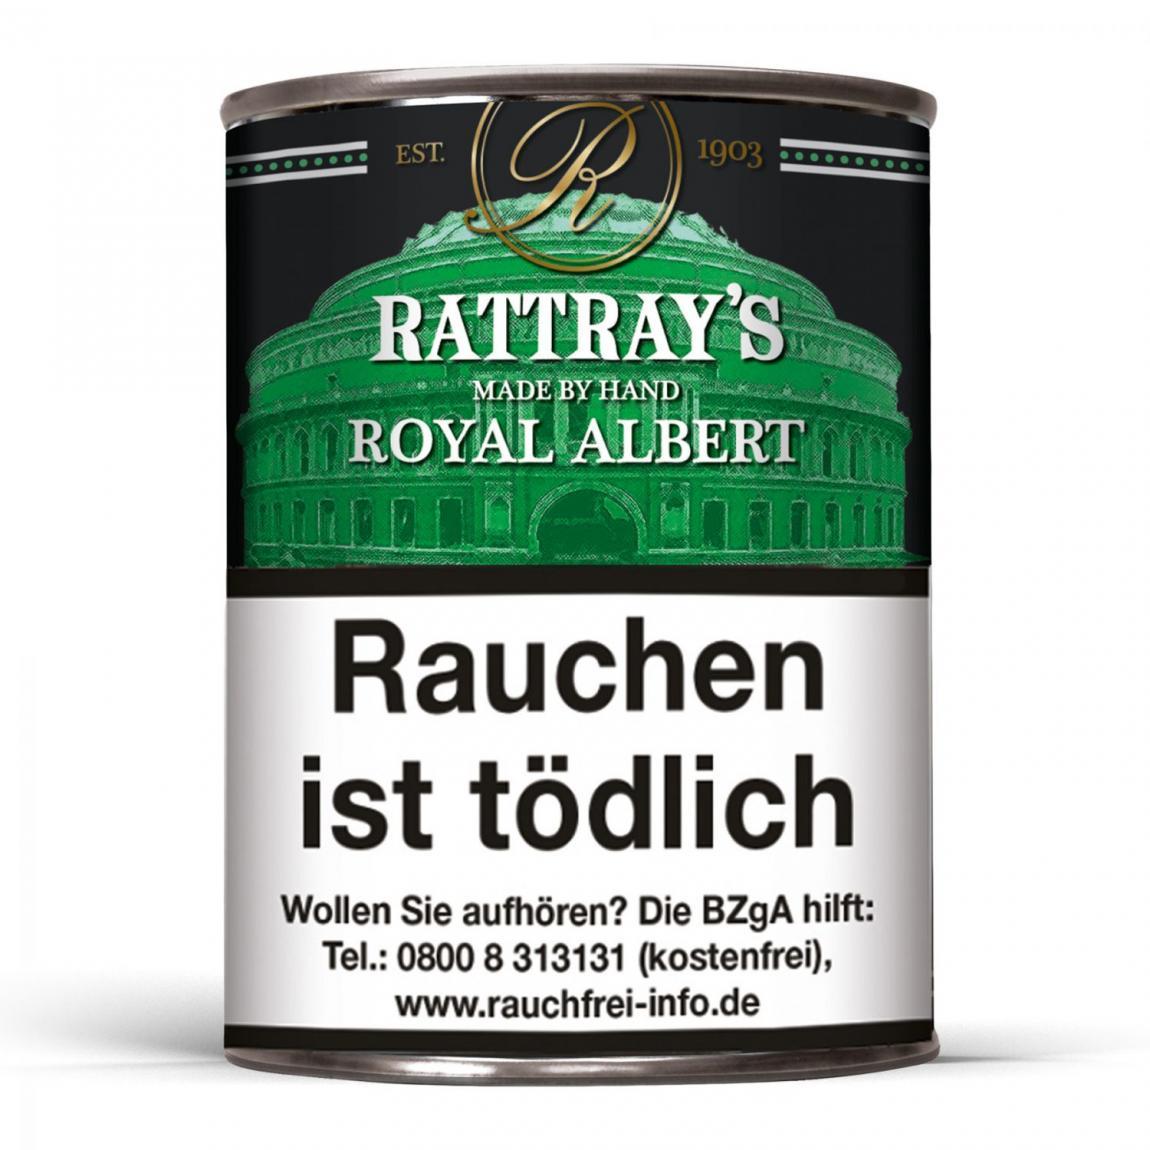 Rattray's Royal Albert 100g Dose